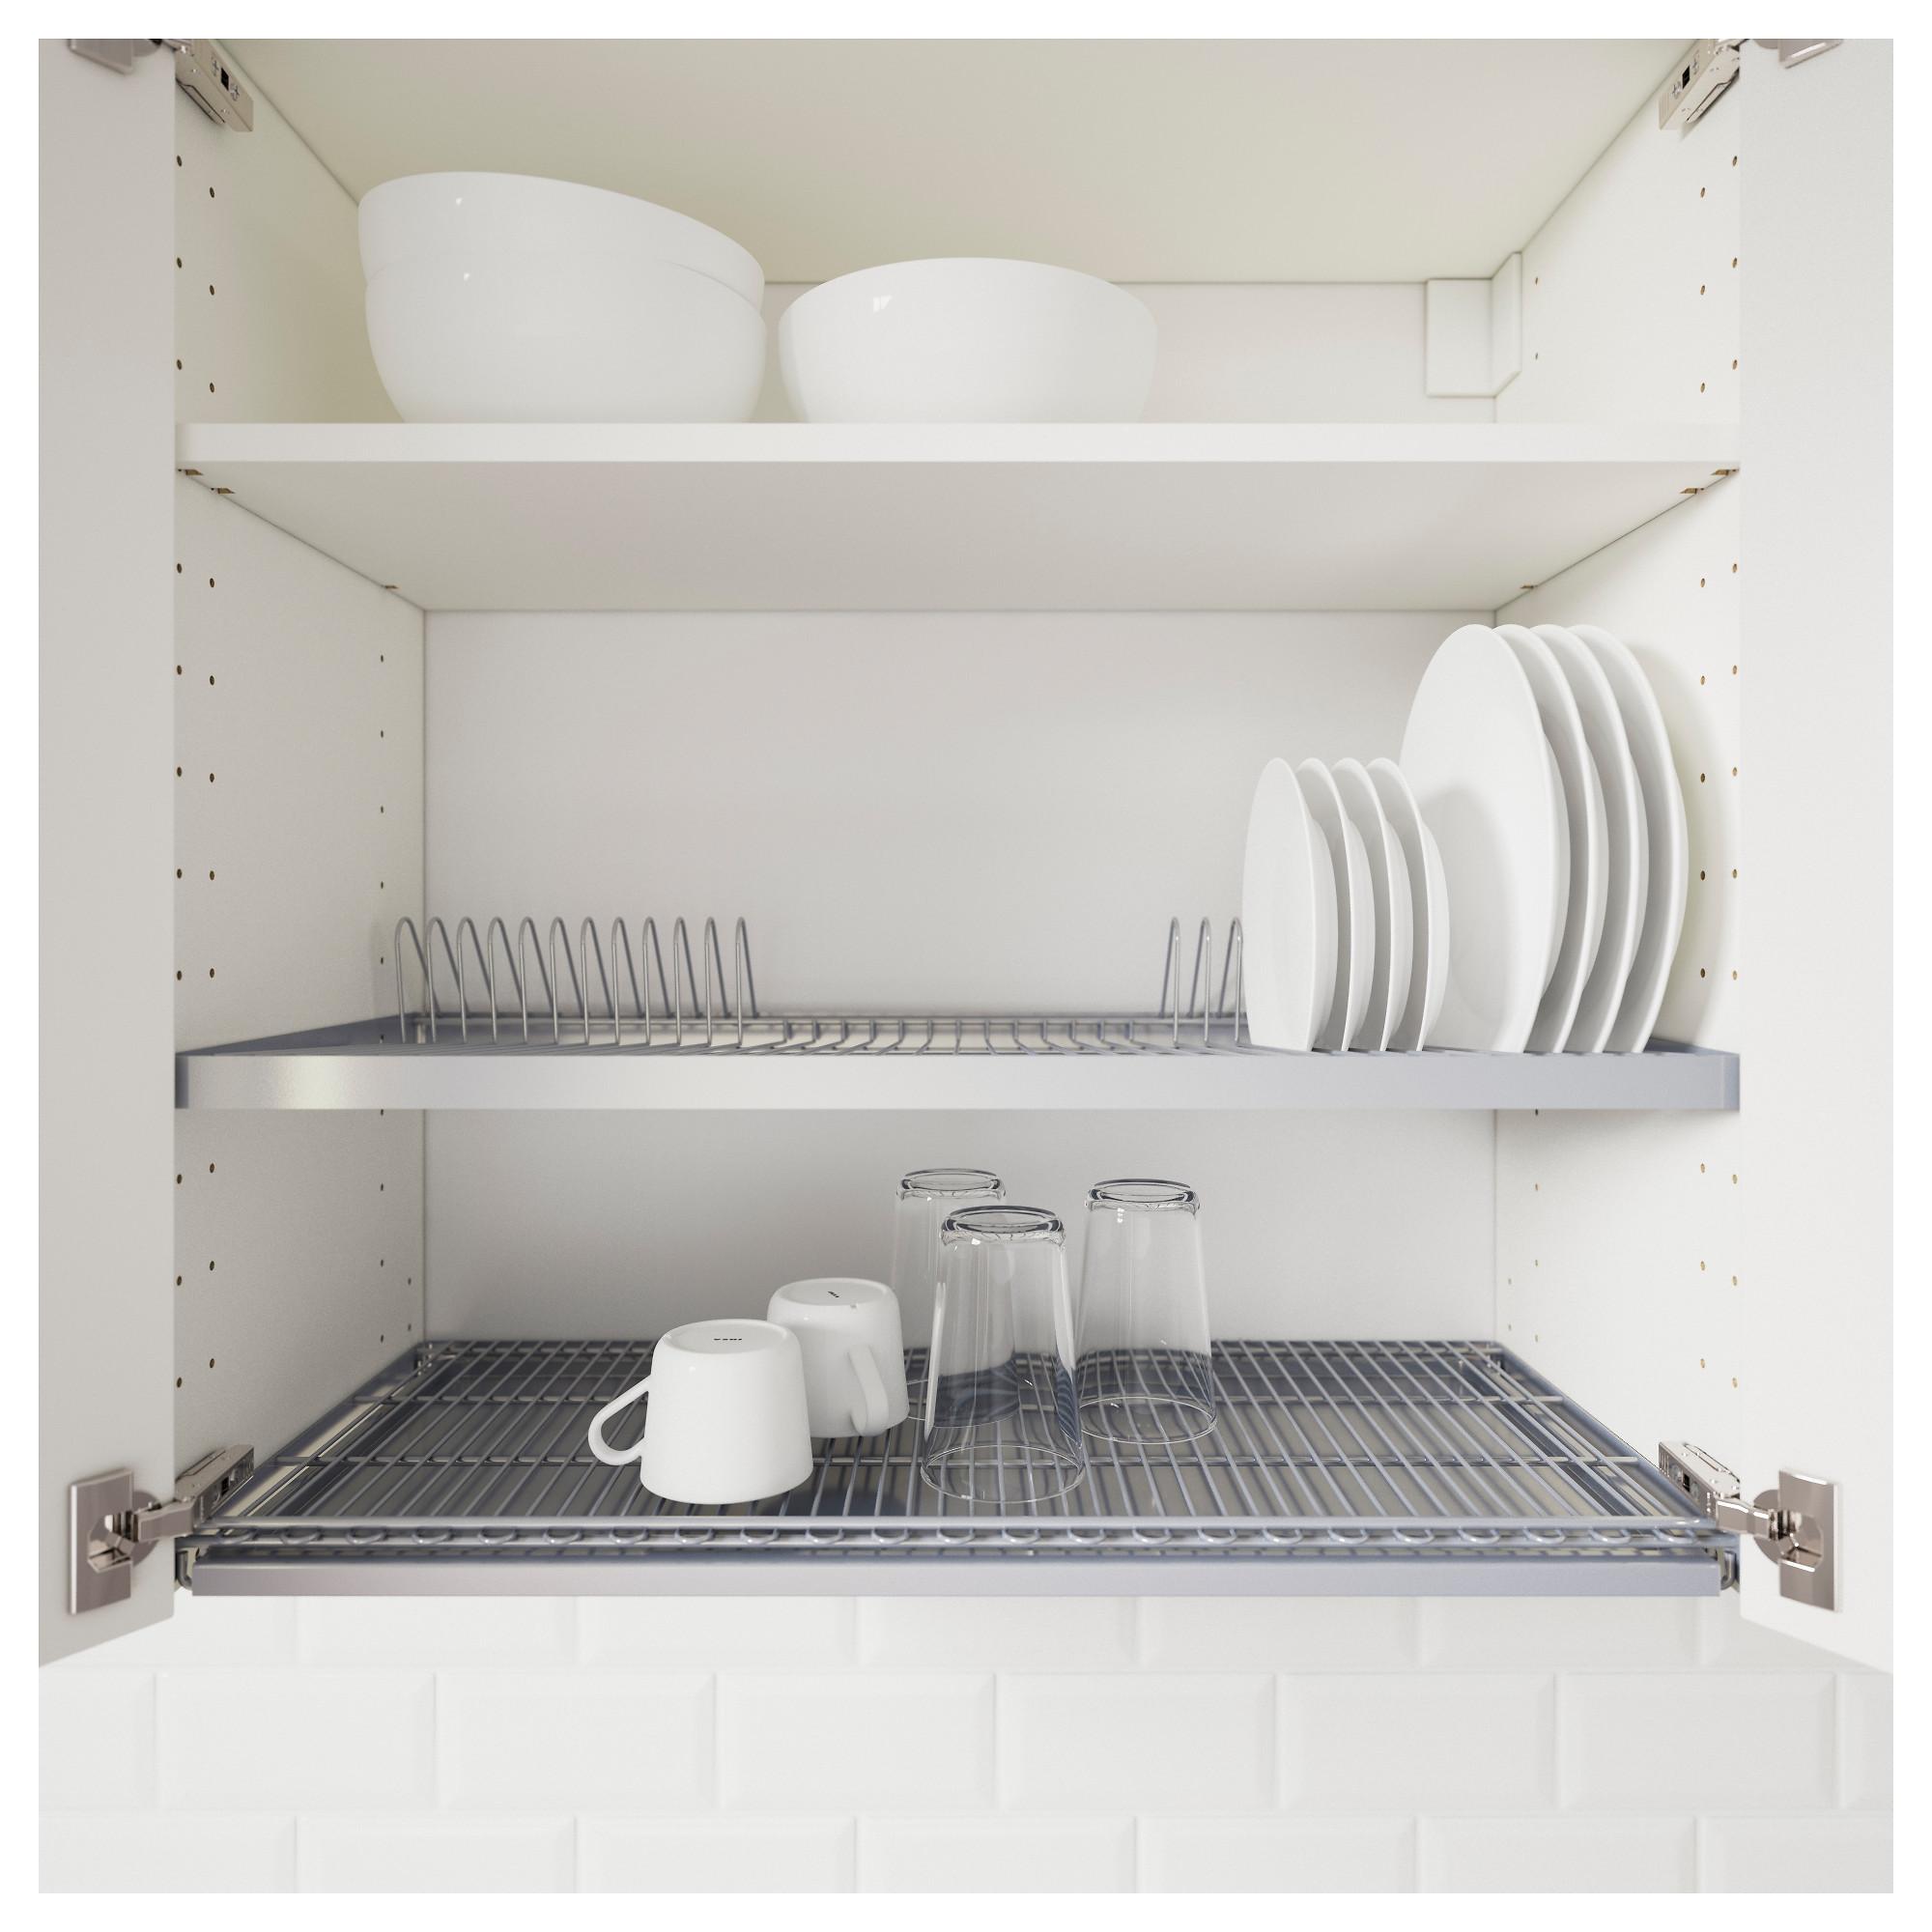 UTRUSTA Dish drainer for wall cabinet IKEA | Pinterest | Dish ...